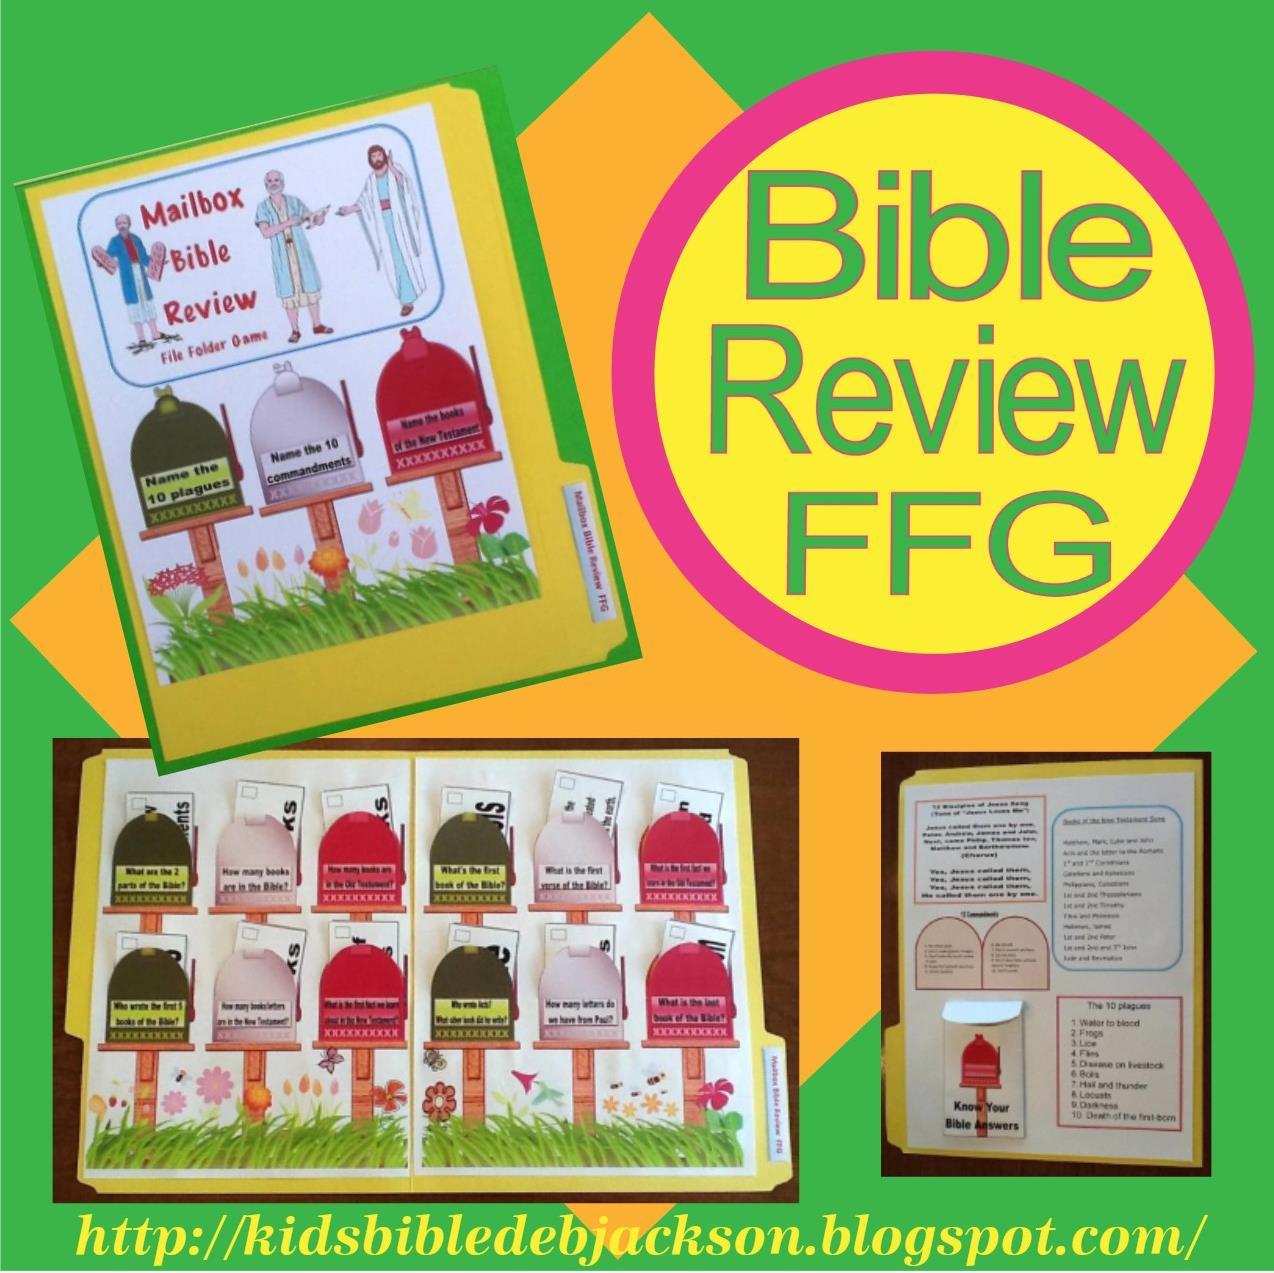 Bible Fun For Kids Mailbox Bible Review Ffg